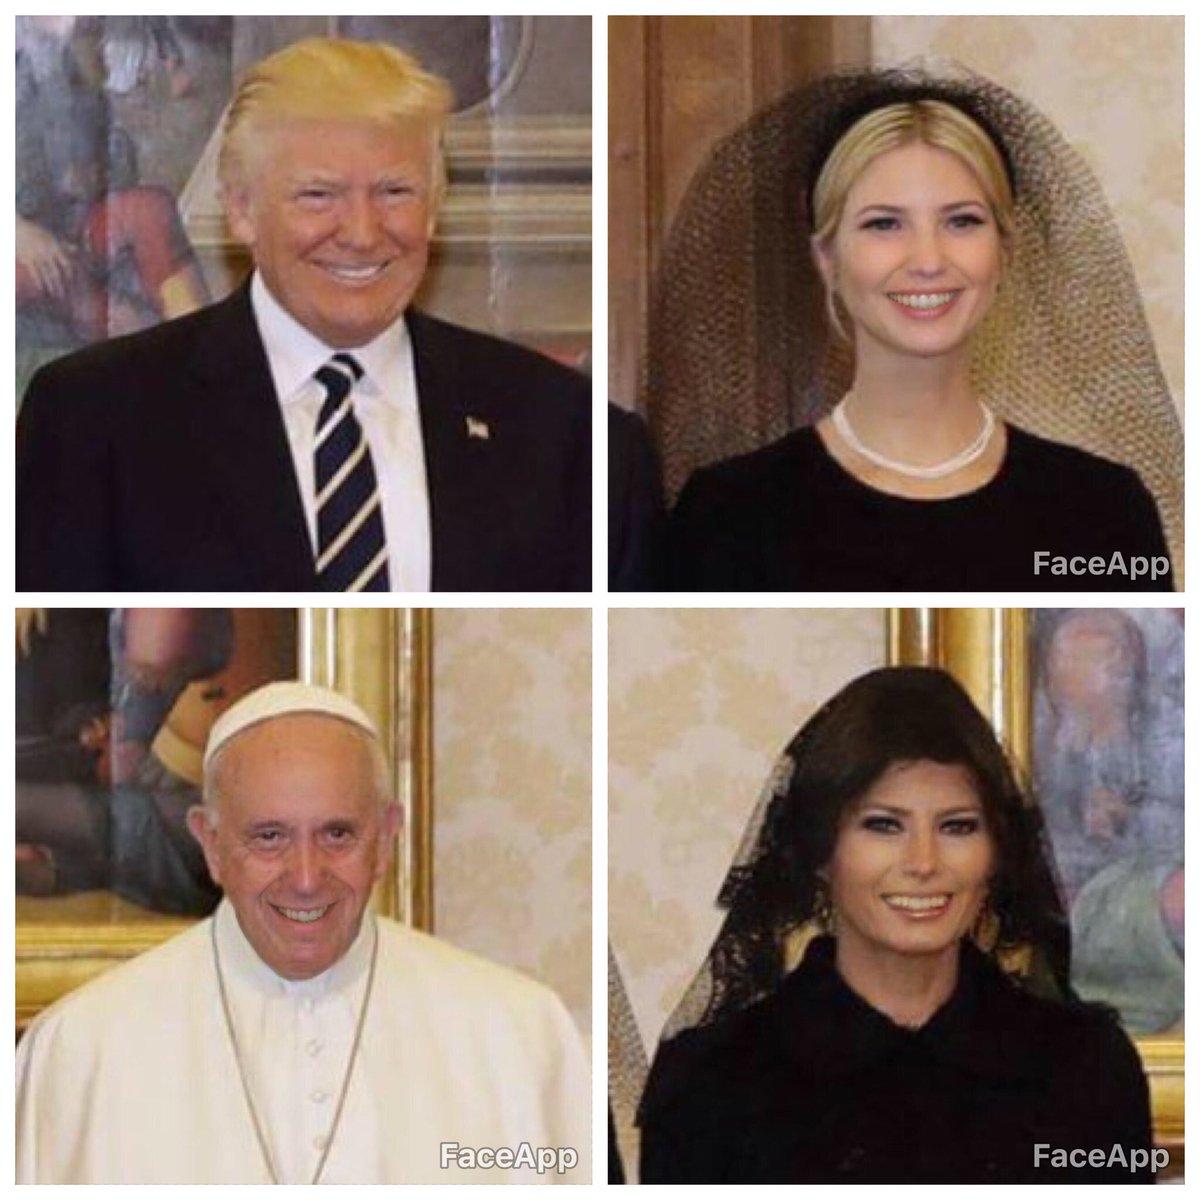 Don't worry, be happy! #pope #trump #backinblack #godsavethepope #happ...